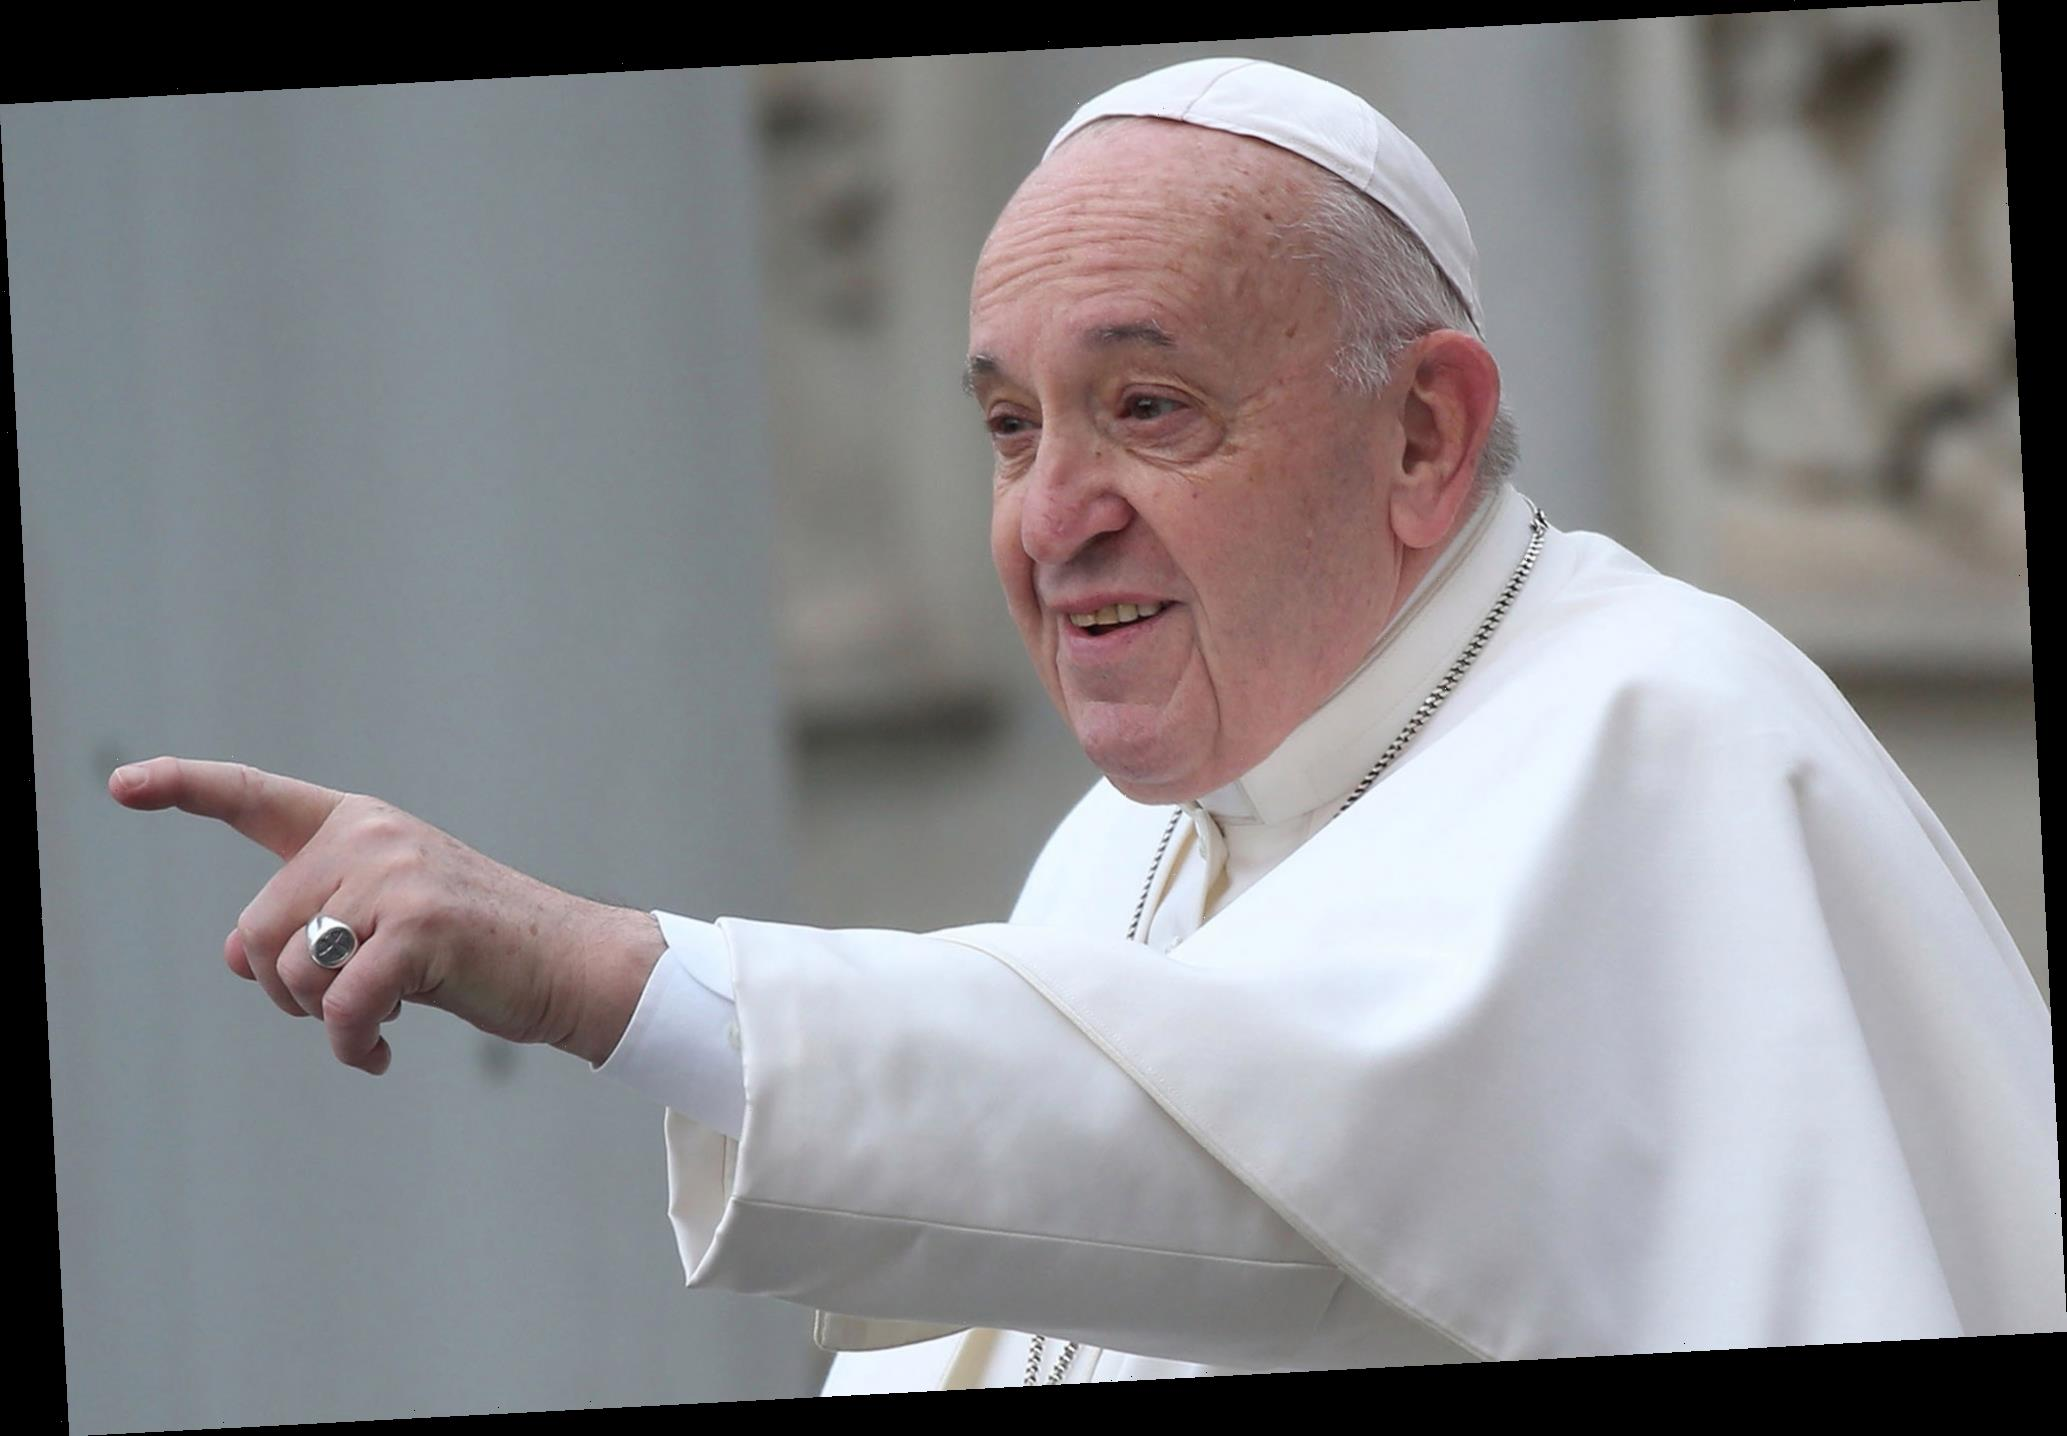 Pope Francis to livestream Sunday prayers amid coronavirus crisis